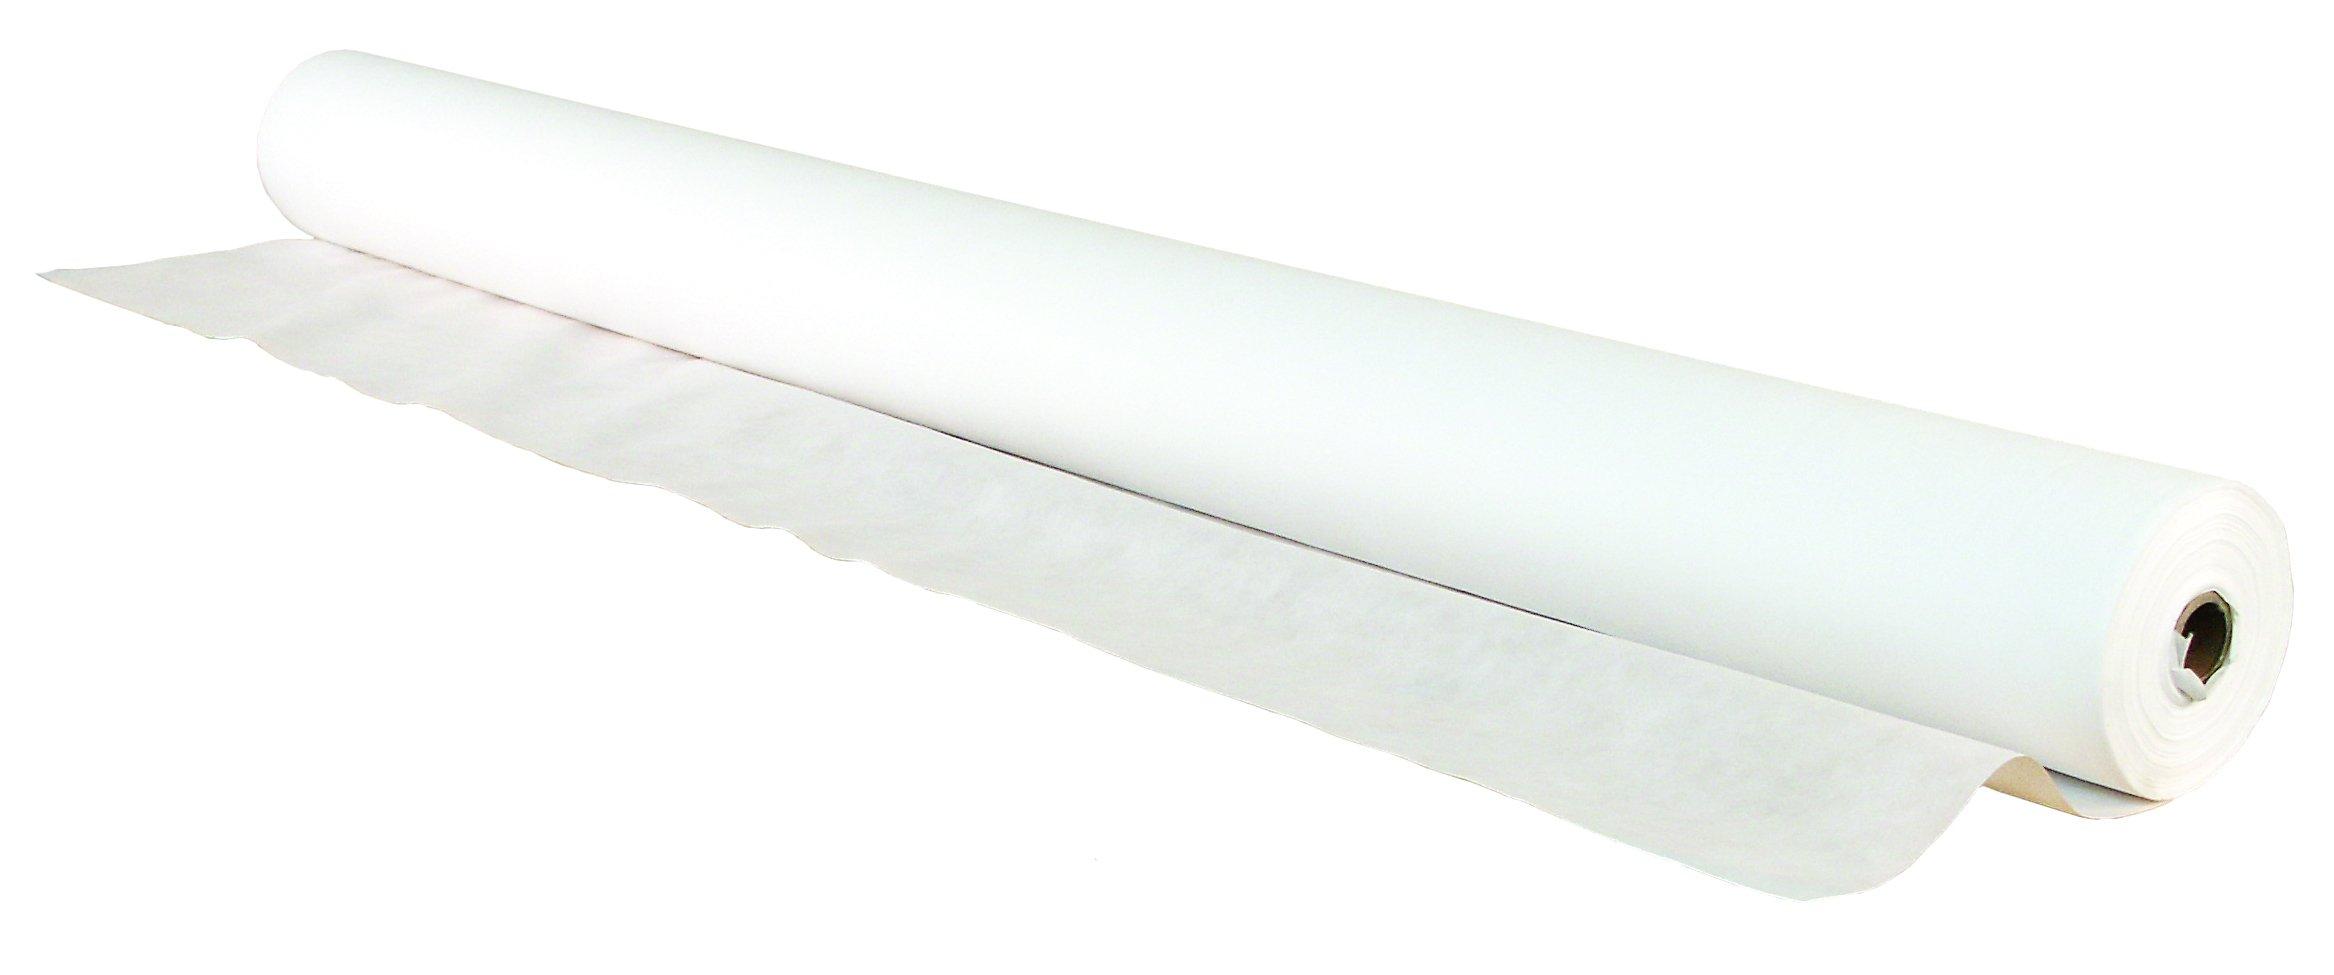 Poly-Tex - Frost Blanket 2.5 oz, 8' x 250', White